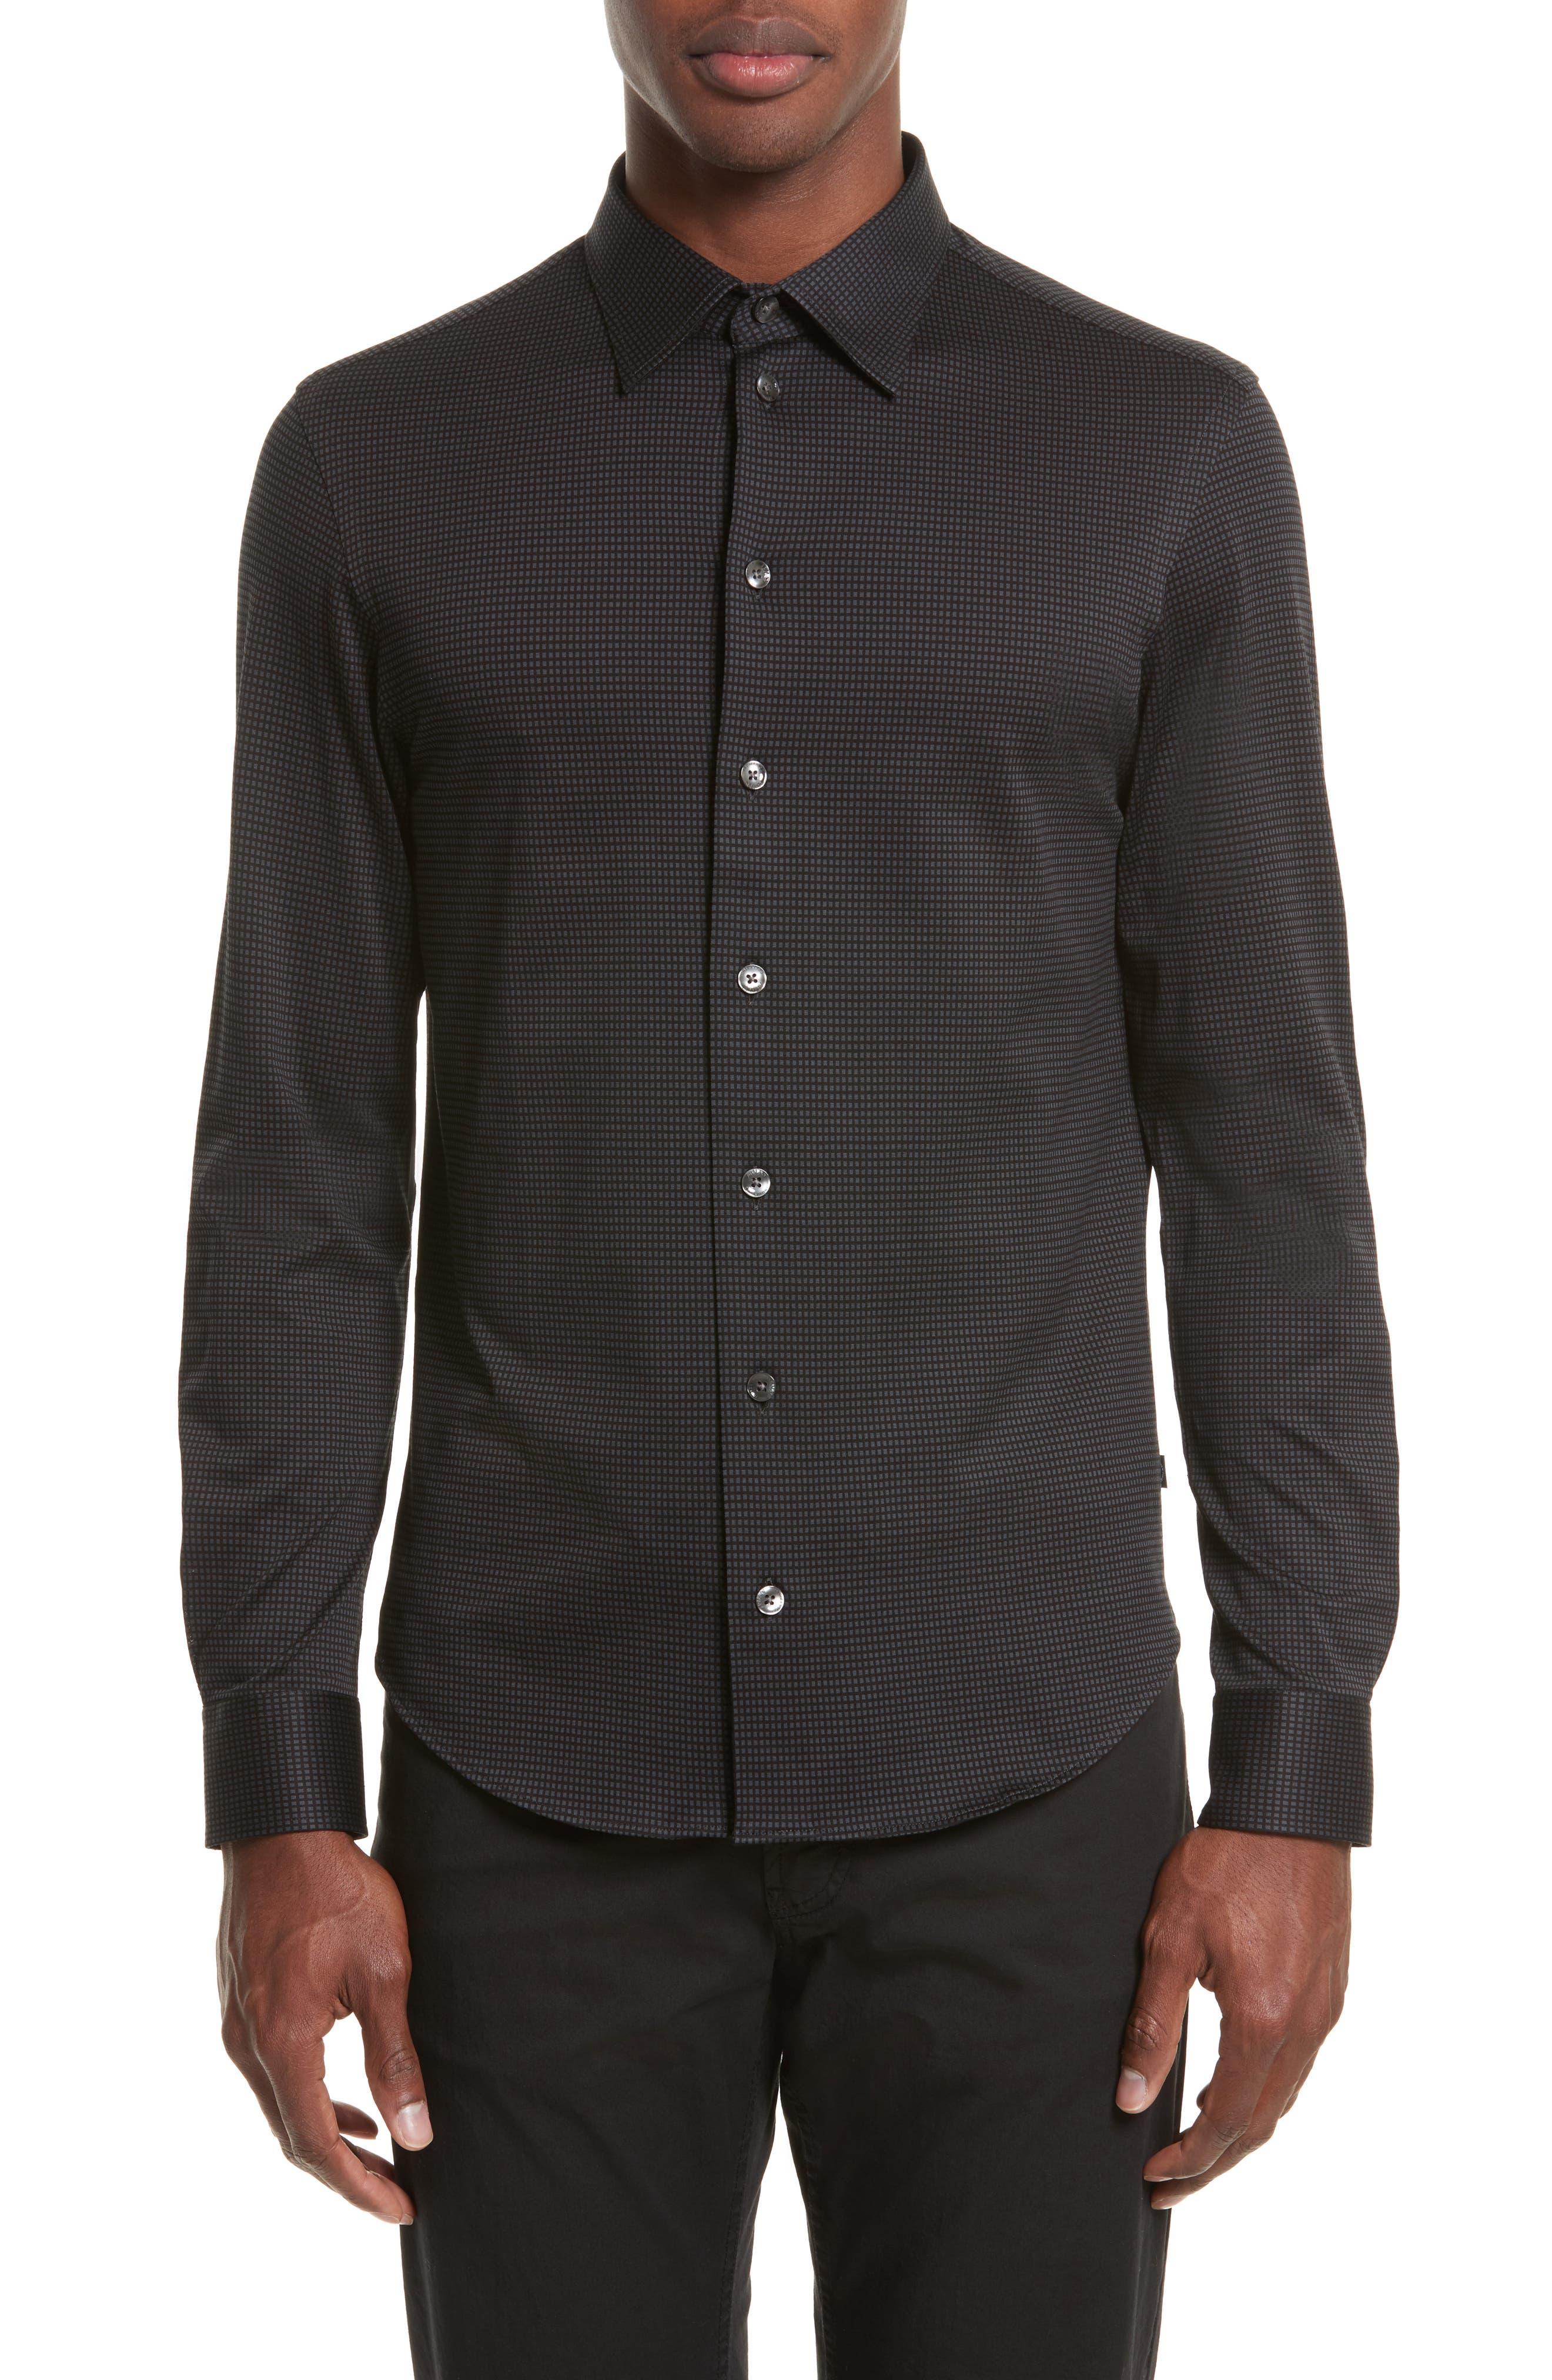 Alternate Image 1 Selected - Armani Collezioni Neat Check Woven Sport Shirt